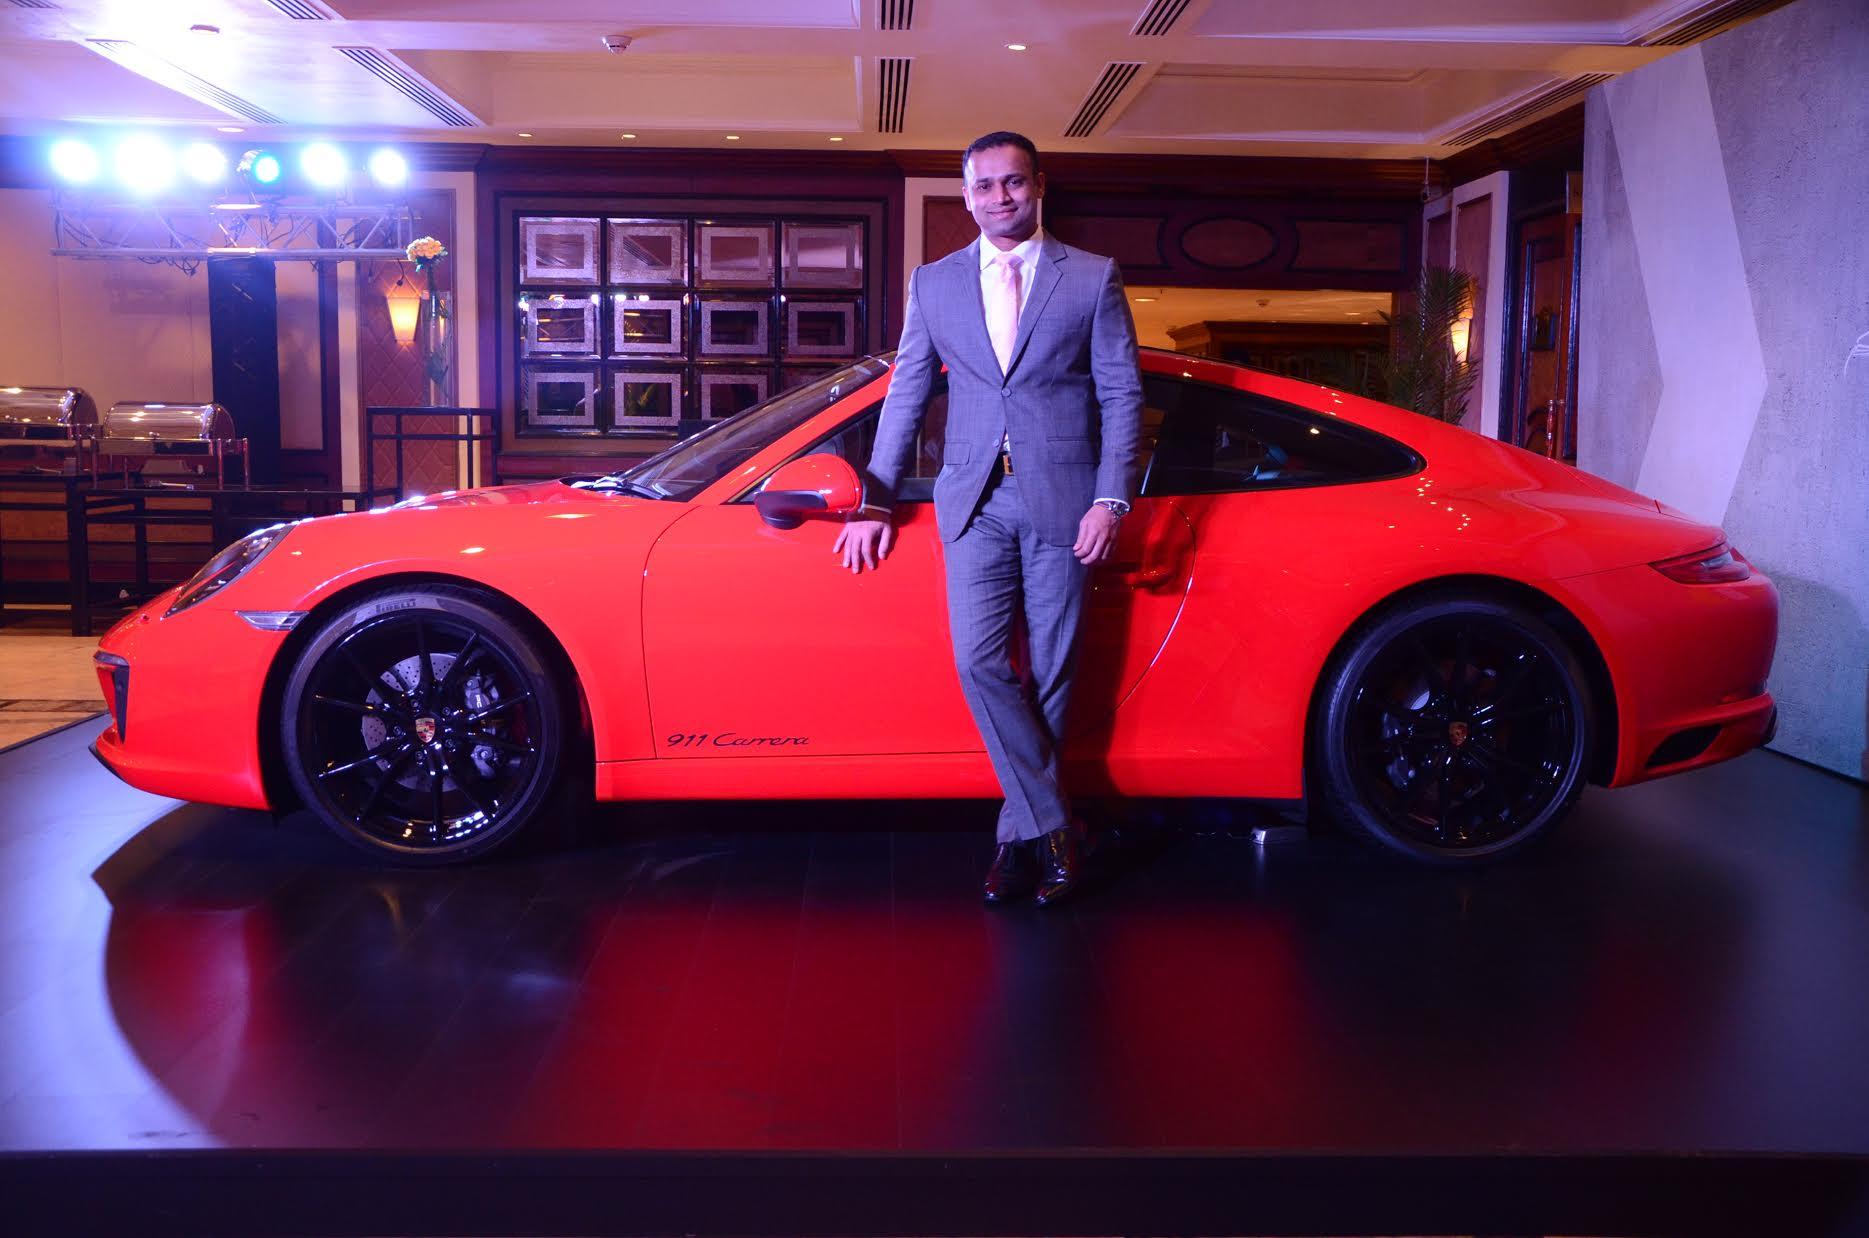 2017 Porsche 911 Carrera side launch in India